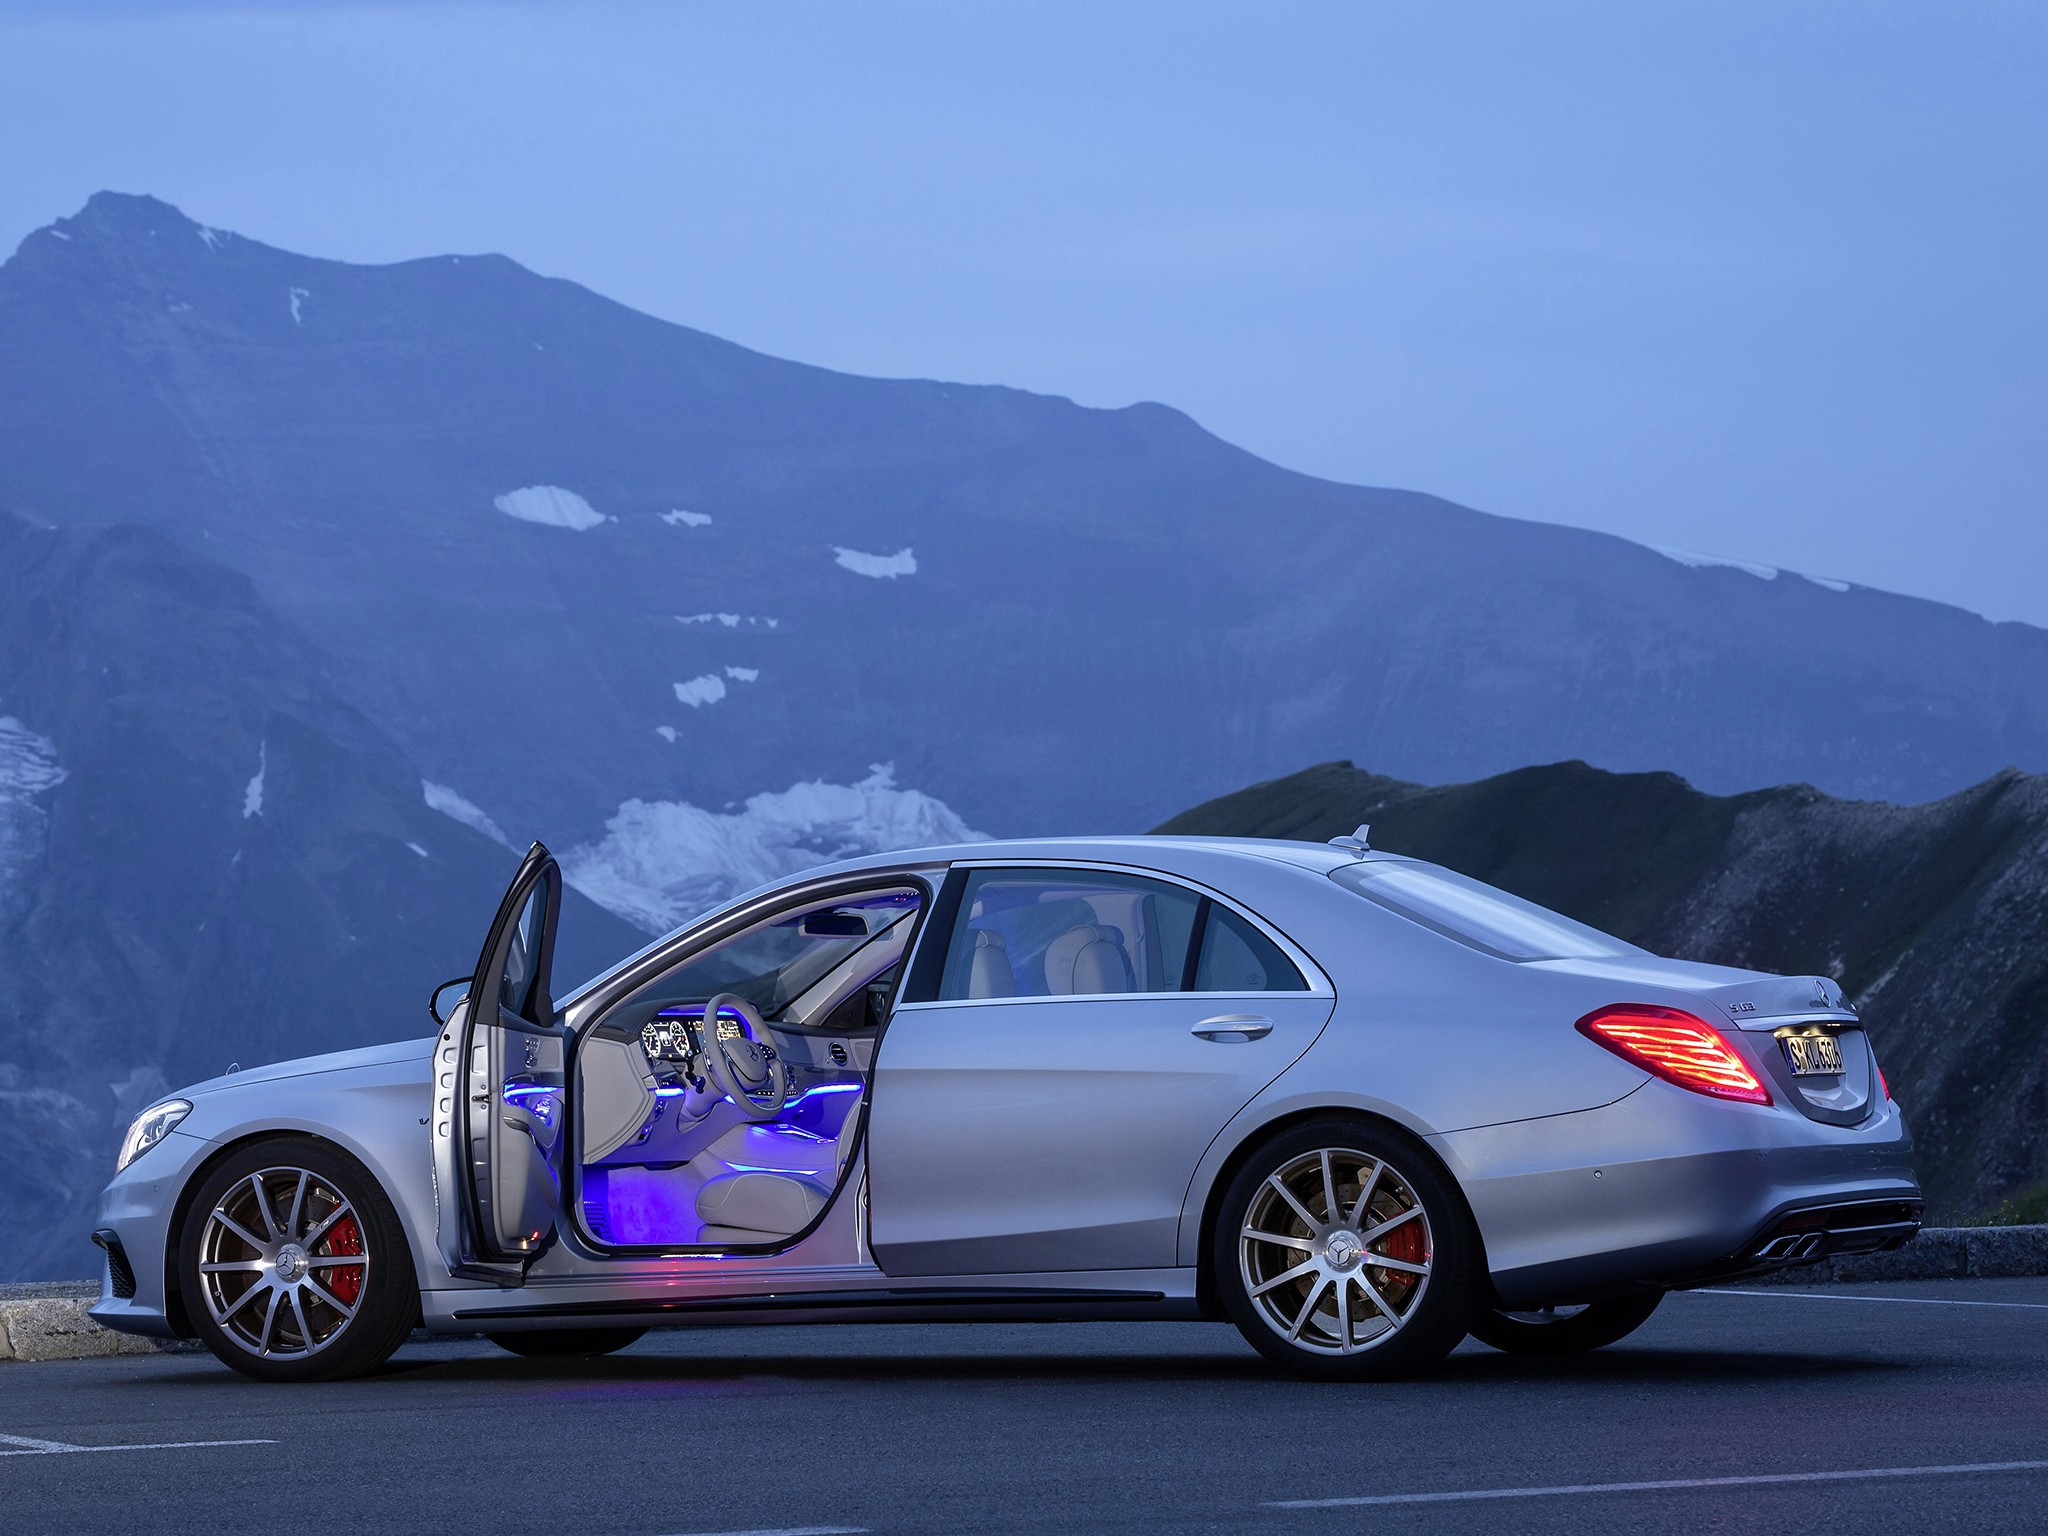 Mercedes benz s 63 amg w222 specs 2013 2014 2015 for 57 mercedes benz